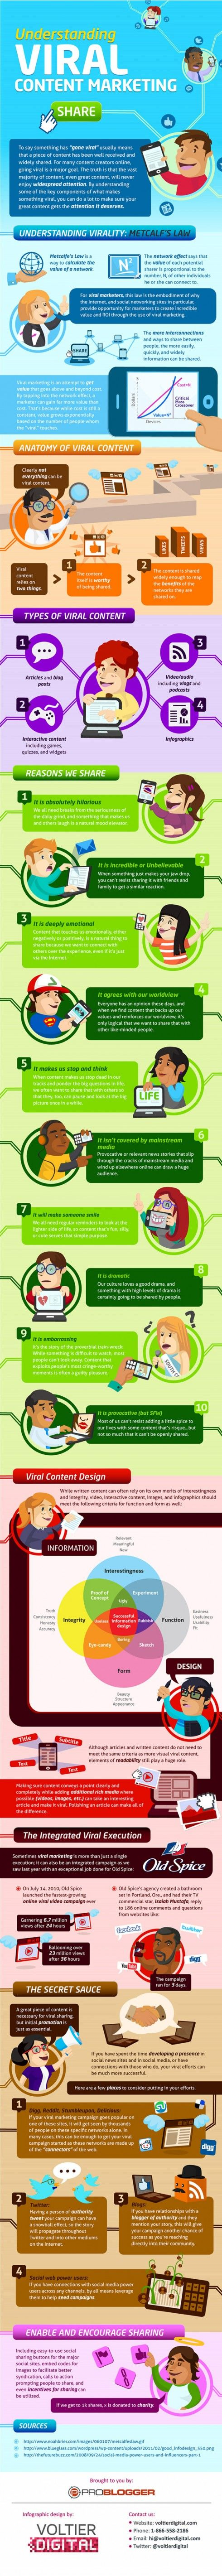 Understanding Viral Content #Marketing #Infographic via Pintetest